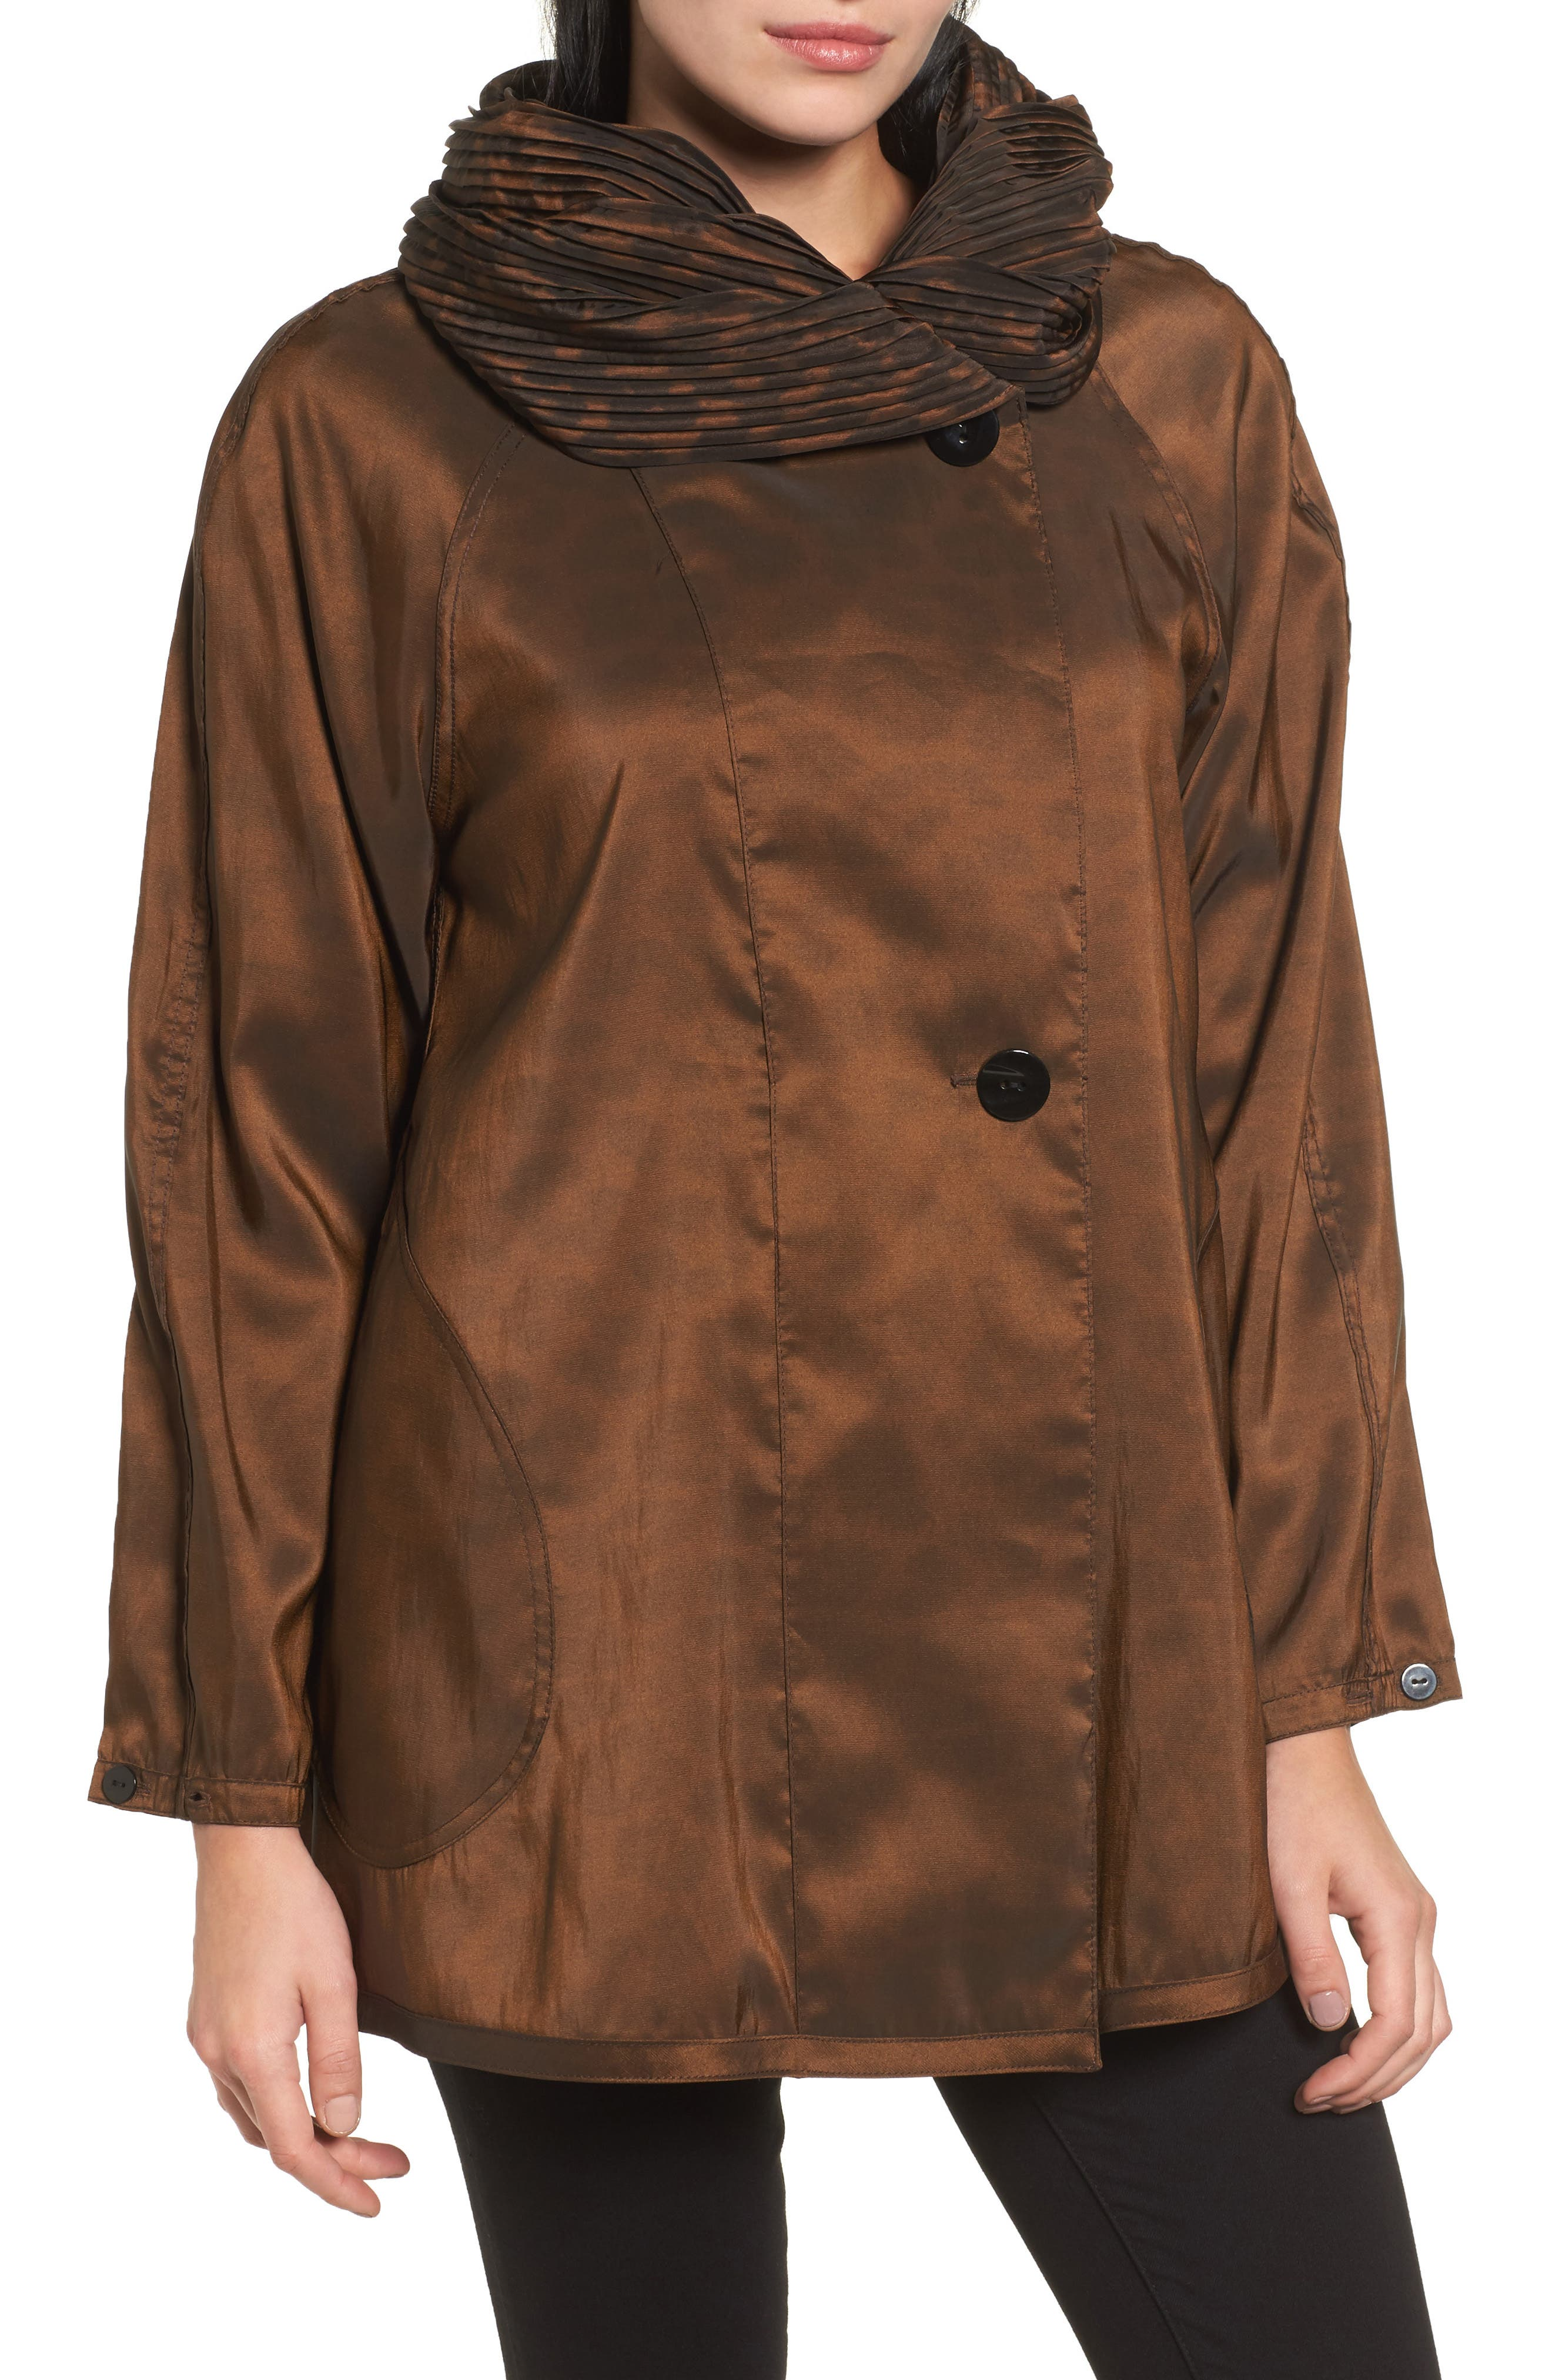 'Mini Donatella Leopard' Reversible Pleat Hood Packable Travel Coat,                             Alternate thumbnail 4, color,                             202